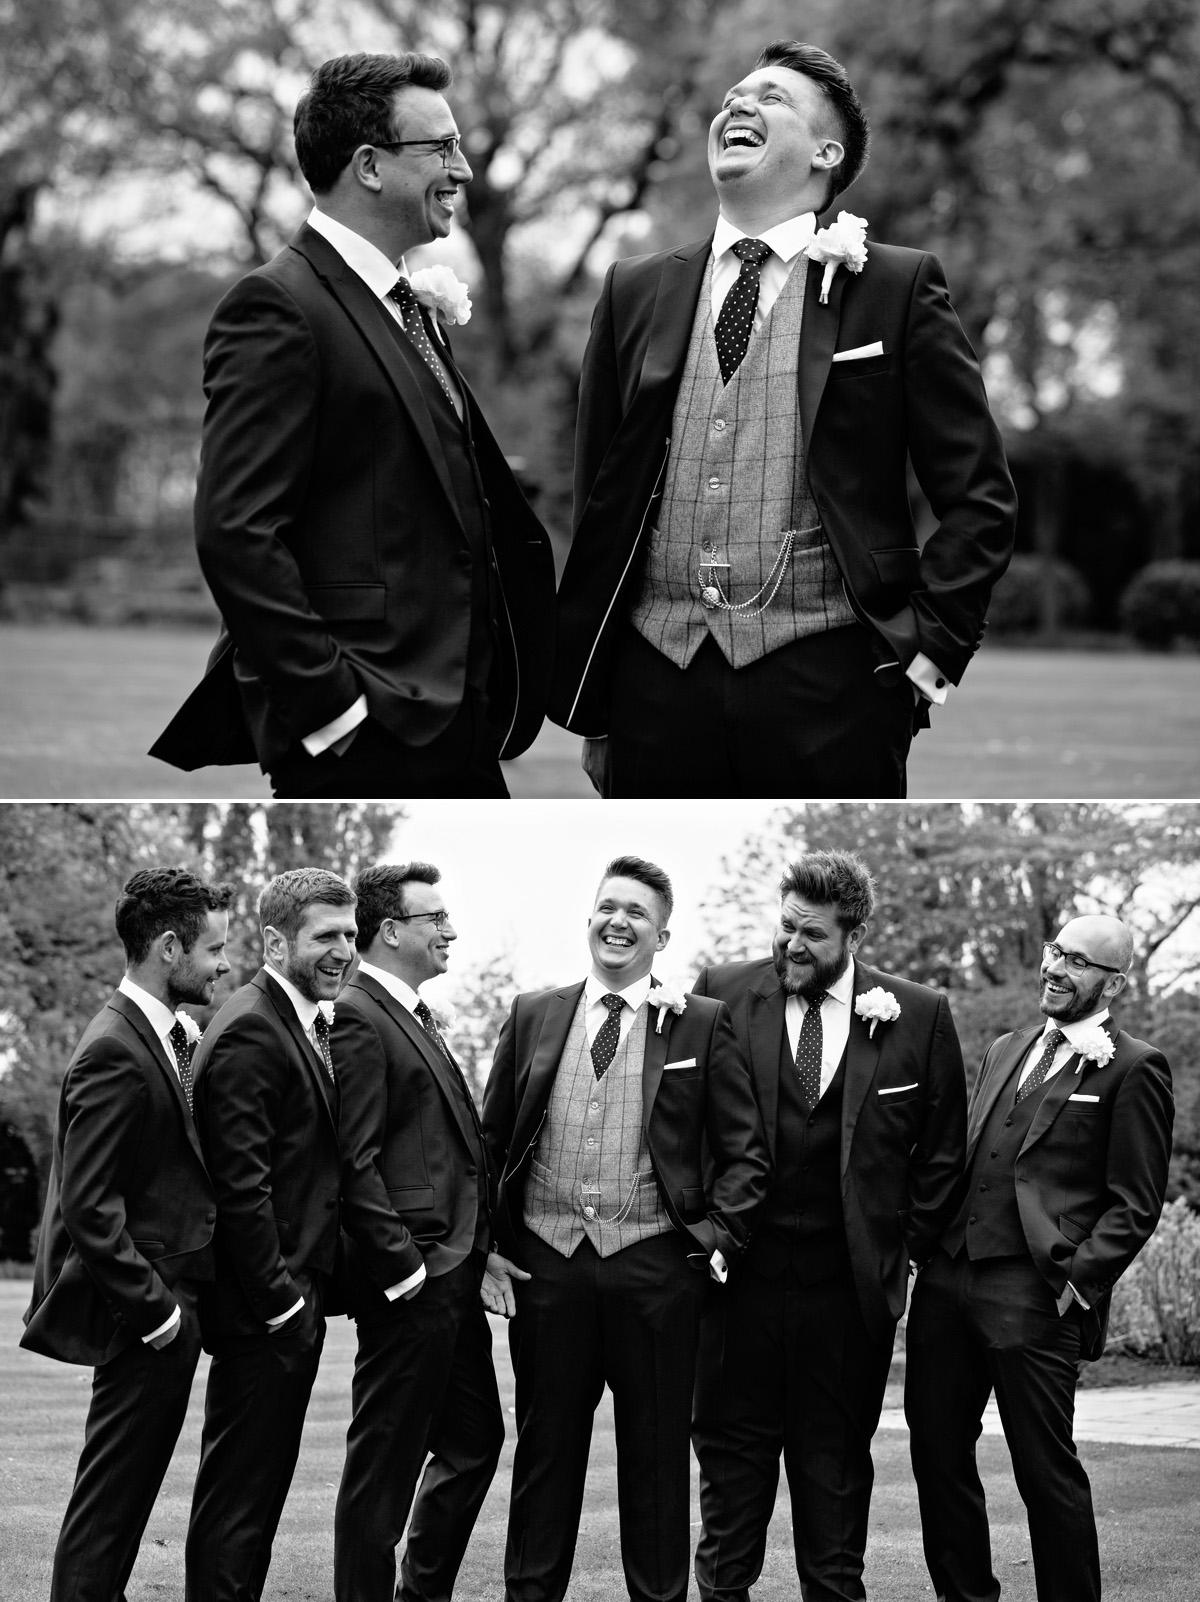 Fun wedding - groom laughing with his groomsmen